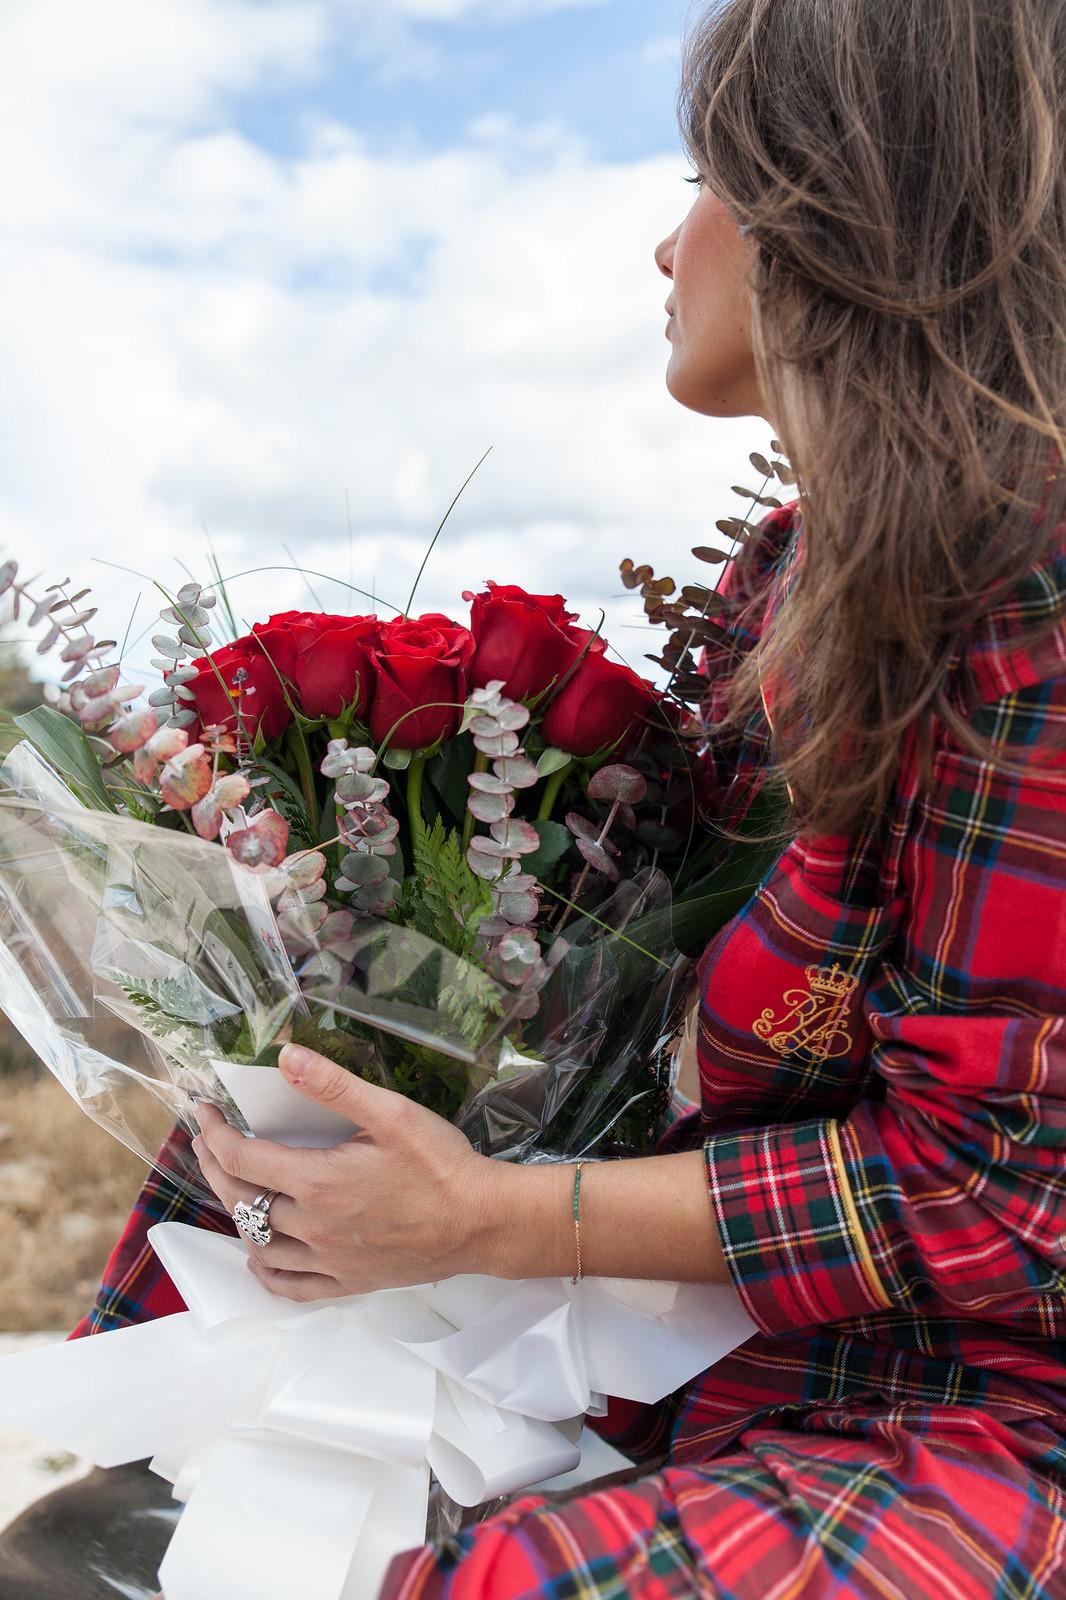 theguestgirl influencer ralph lauren laura santolaria 30 años mujer emprendedora fashion influencer